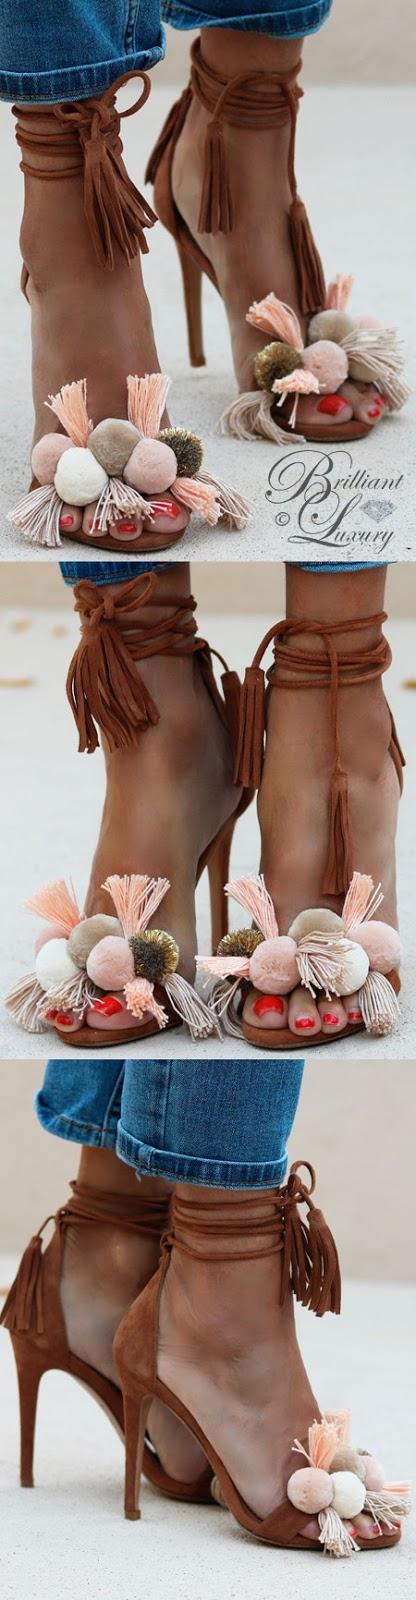 Brilliant Luxury ♦ Alameda Turquesa Anna sandals pastel